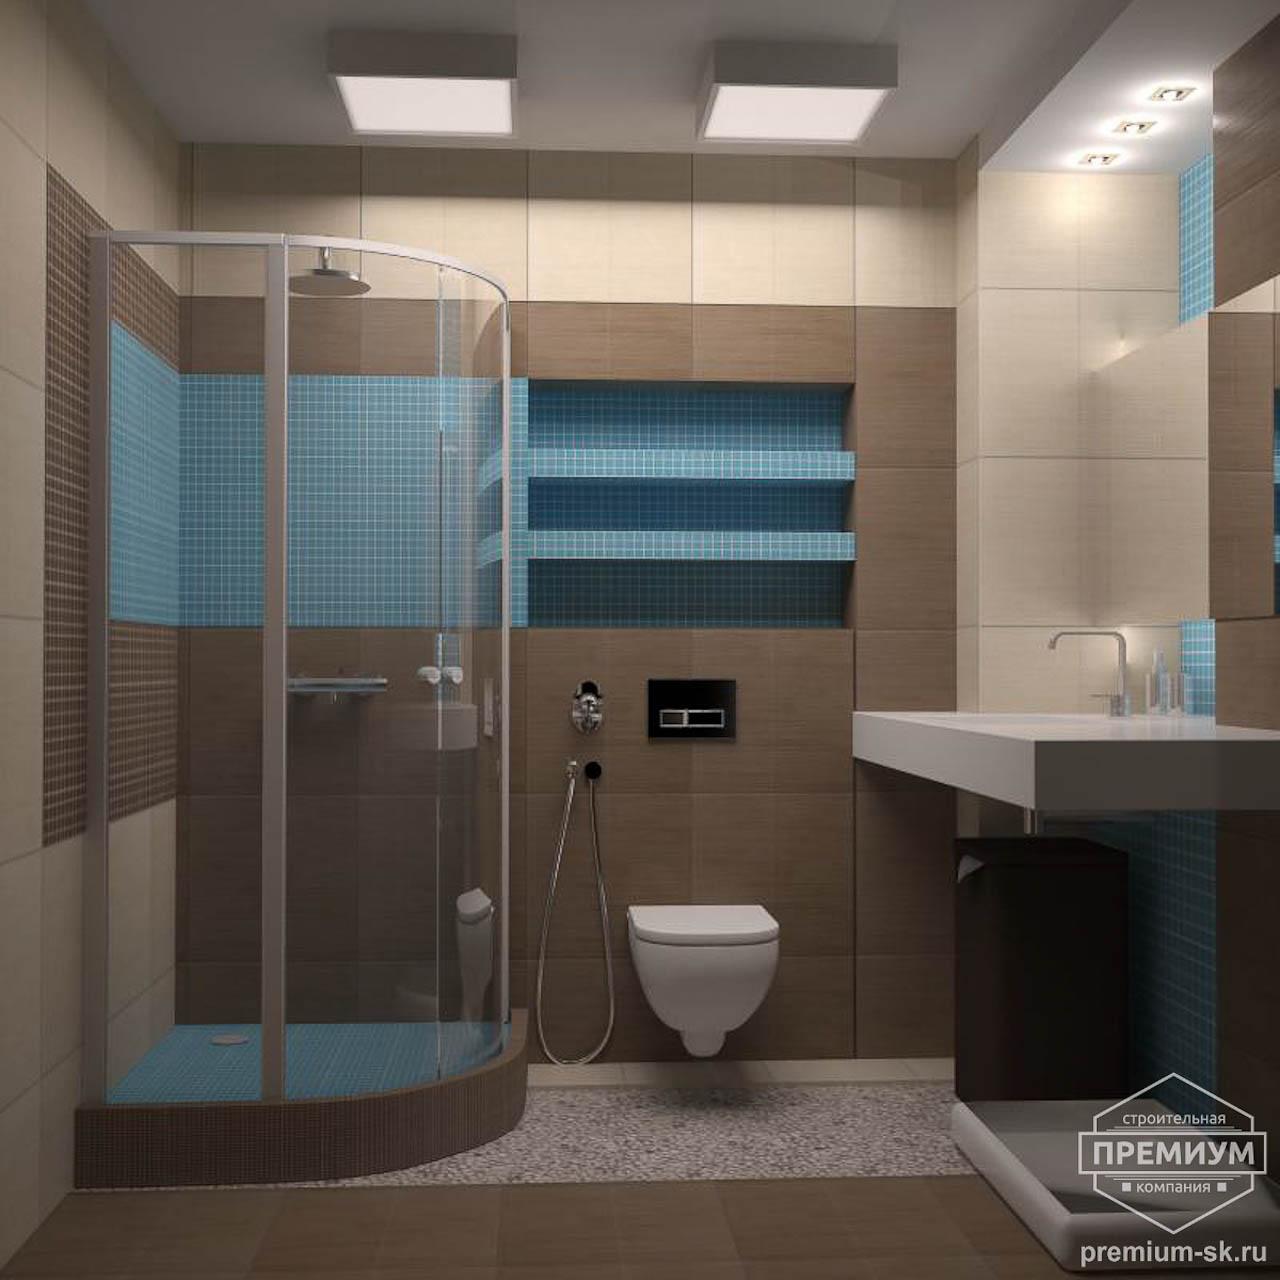 Дизайн интерьера однокомнатной квартиры по ул. Сыромолотова 11 img1565531691